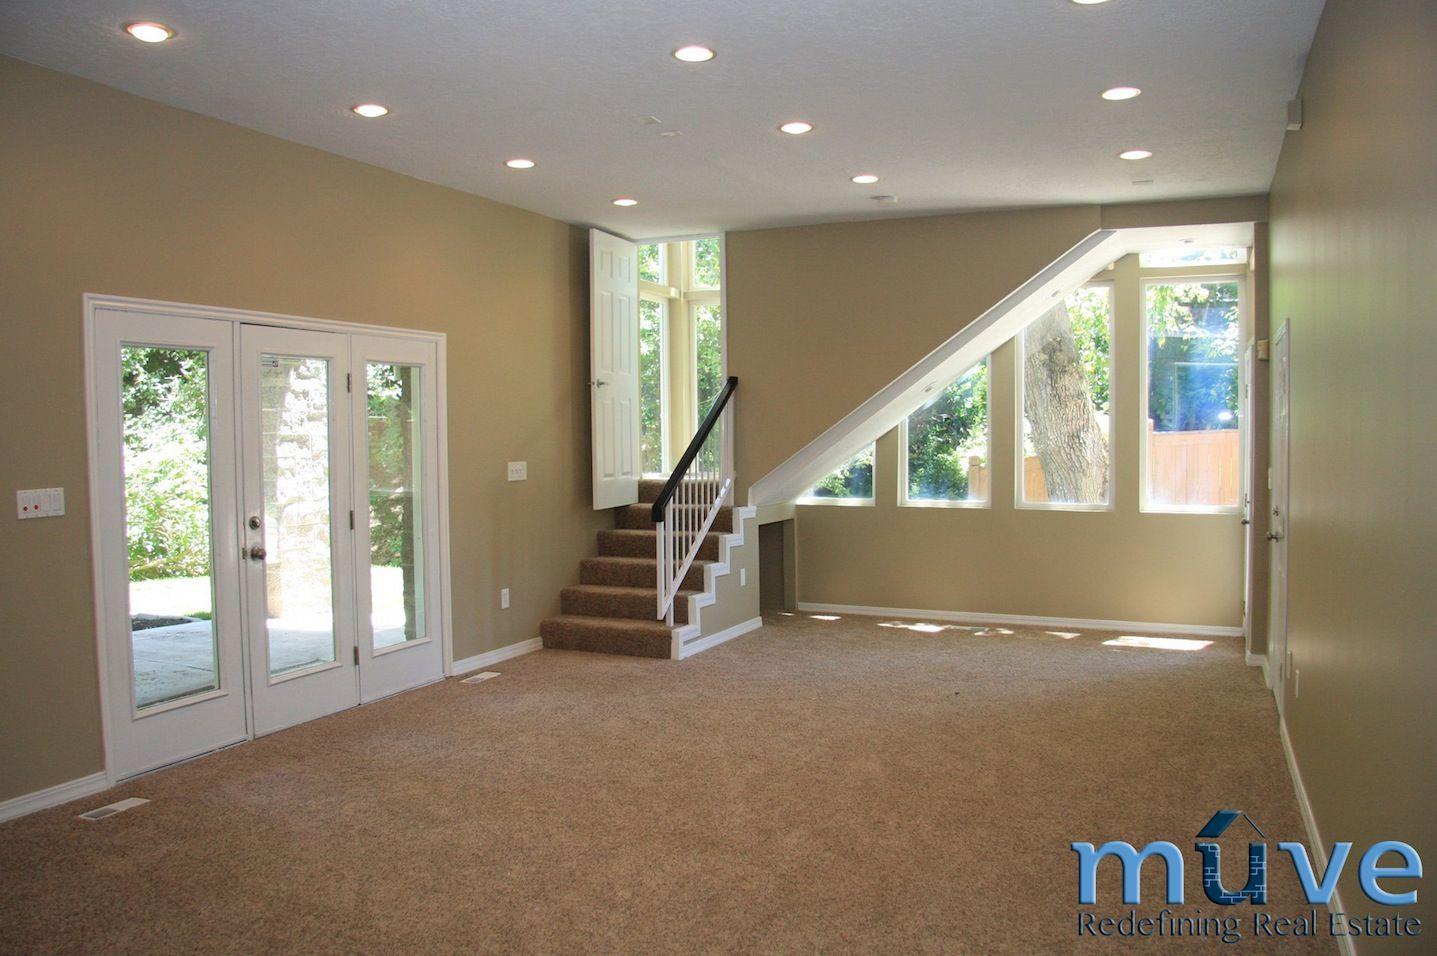 Lighting Basement Washroom Stairs: Basements, Modern